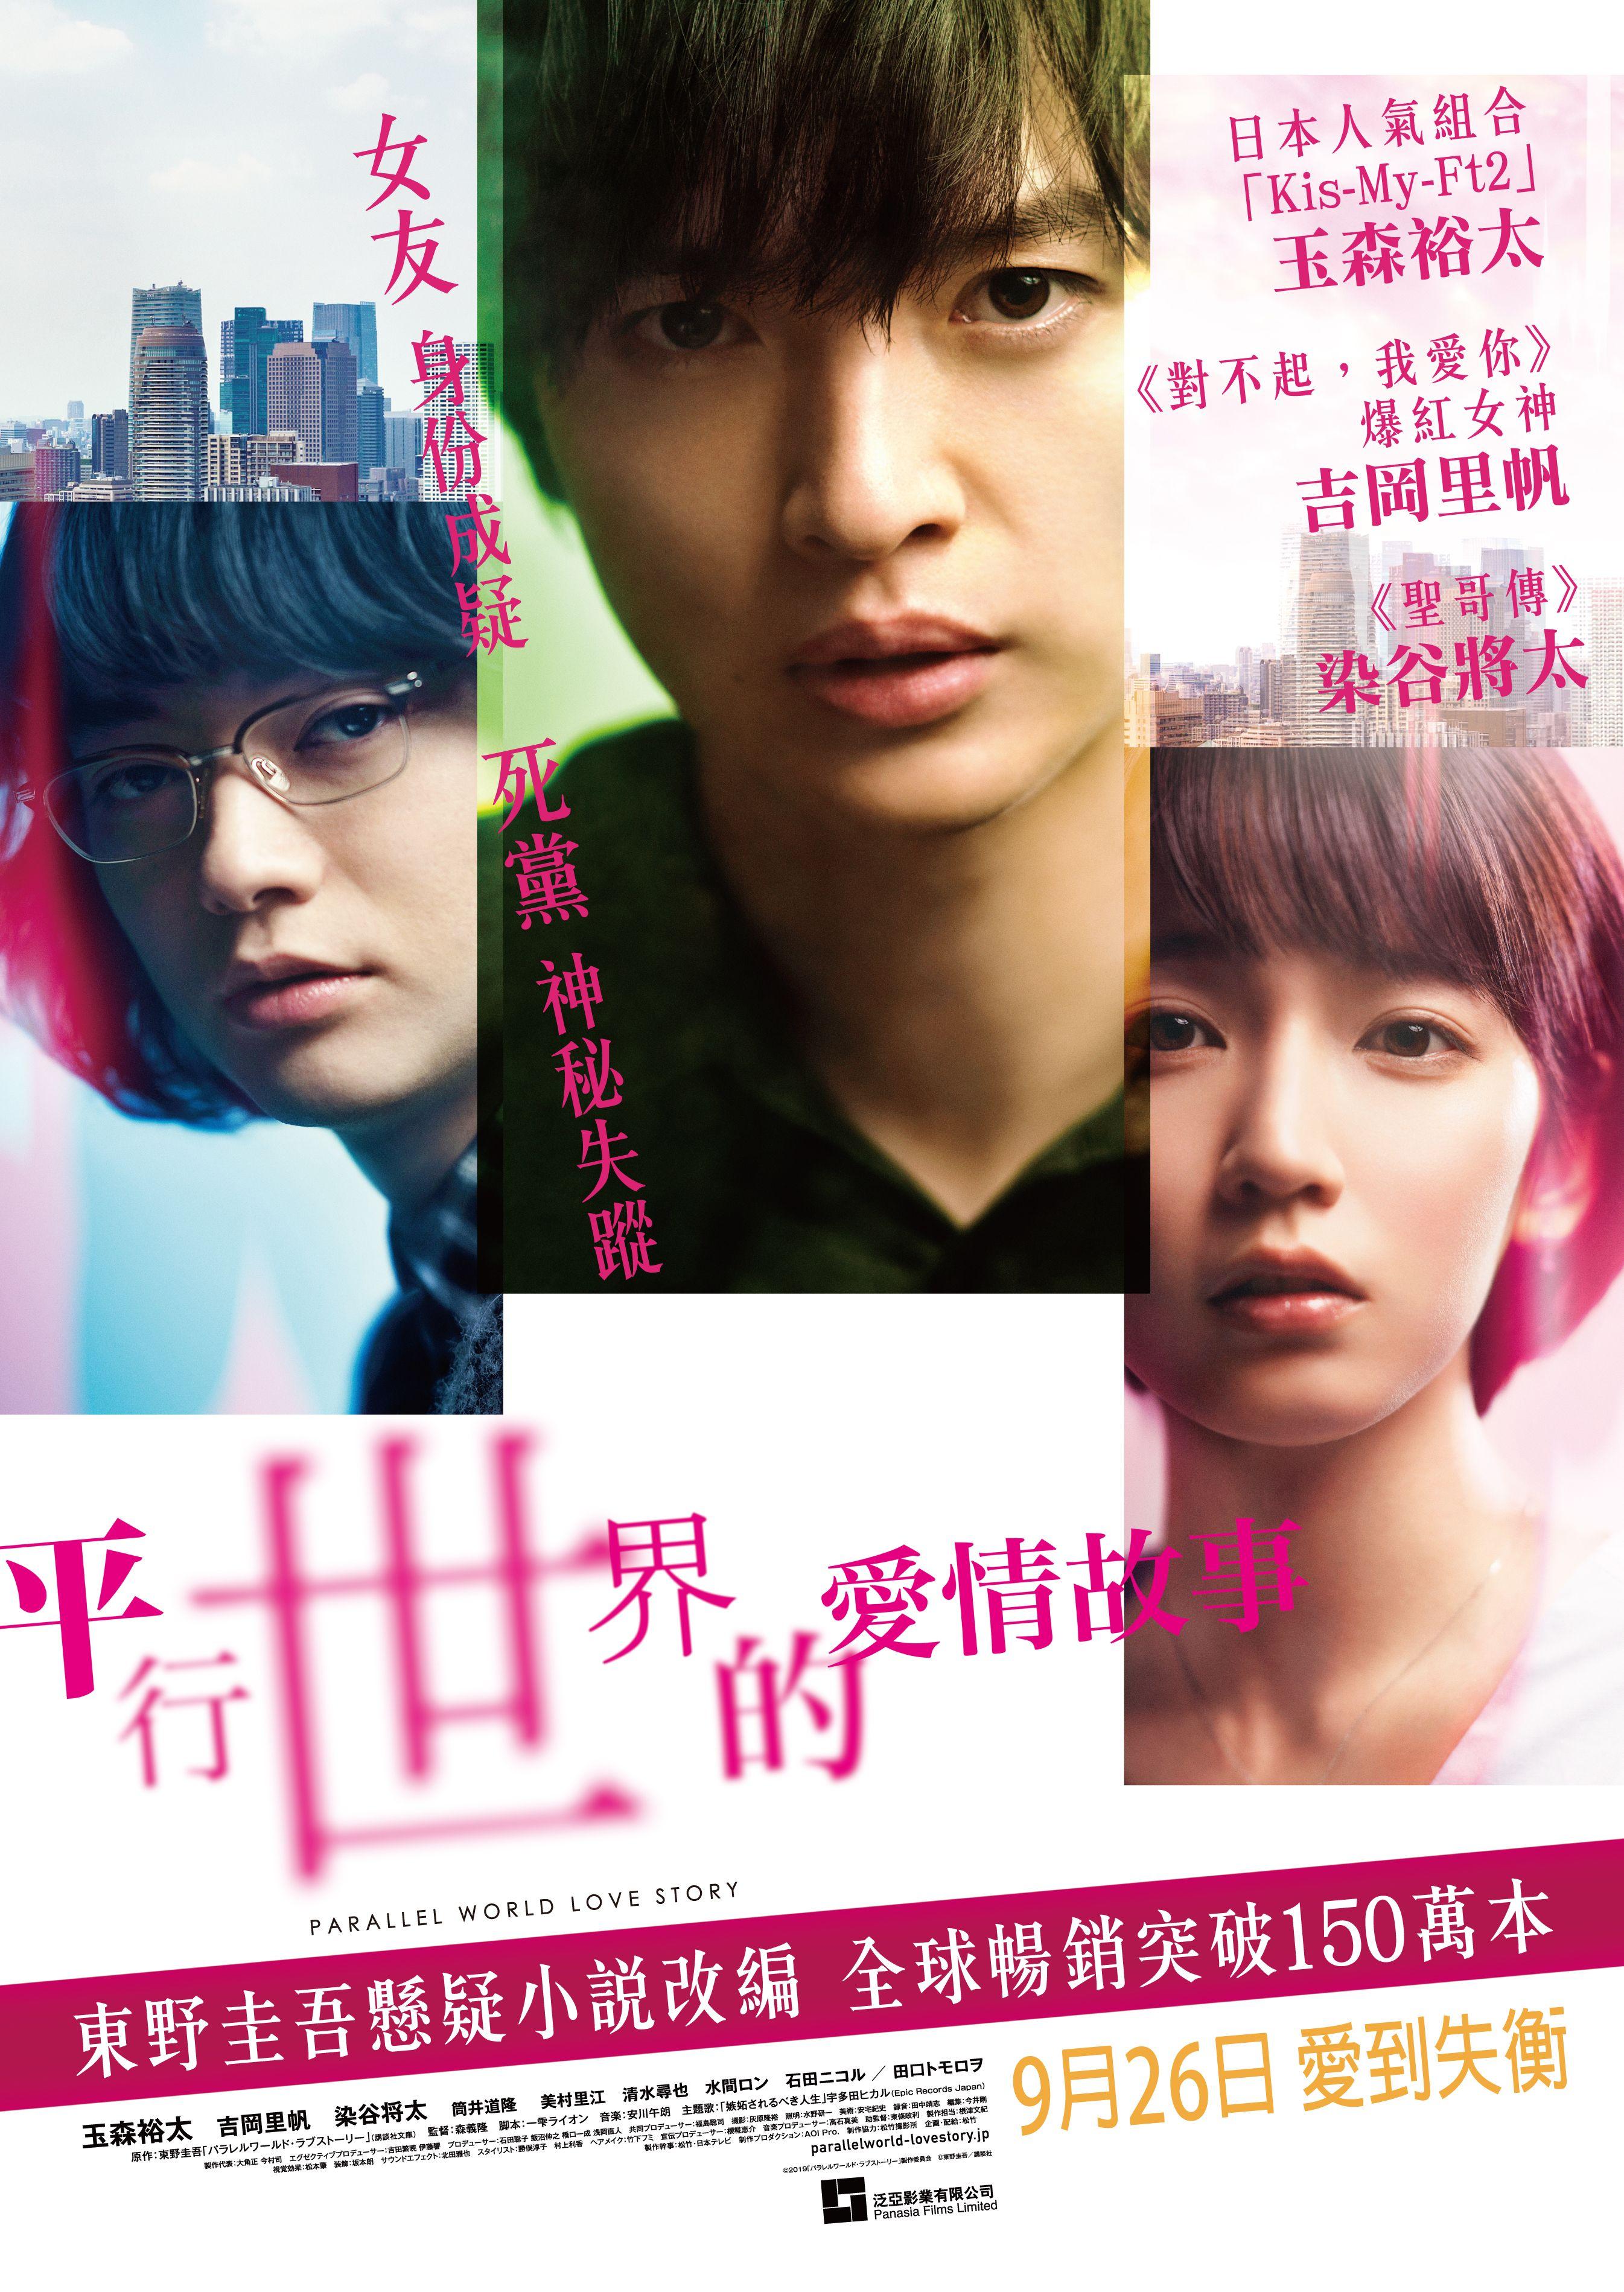 平行世界的愛情故事 Parallel World Love Story Love story, Movies